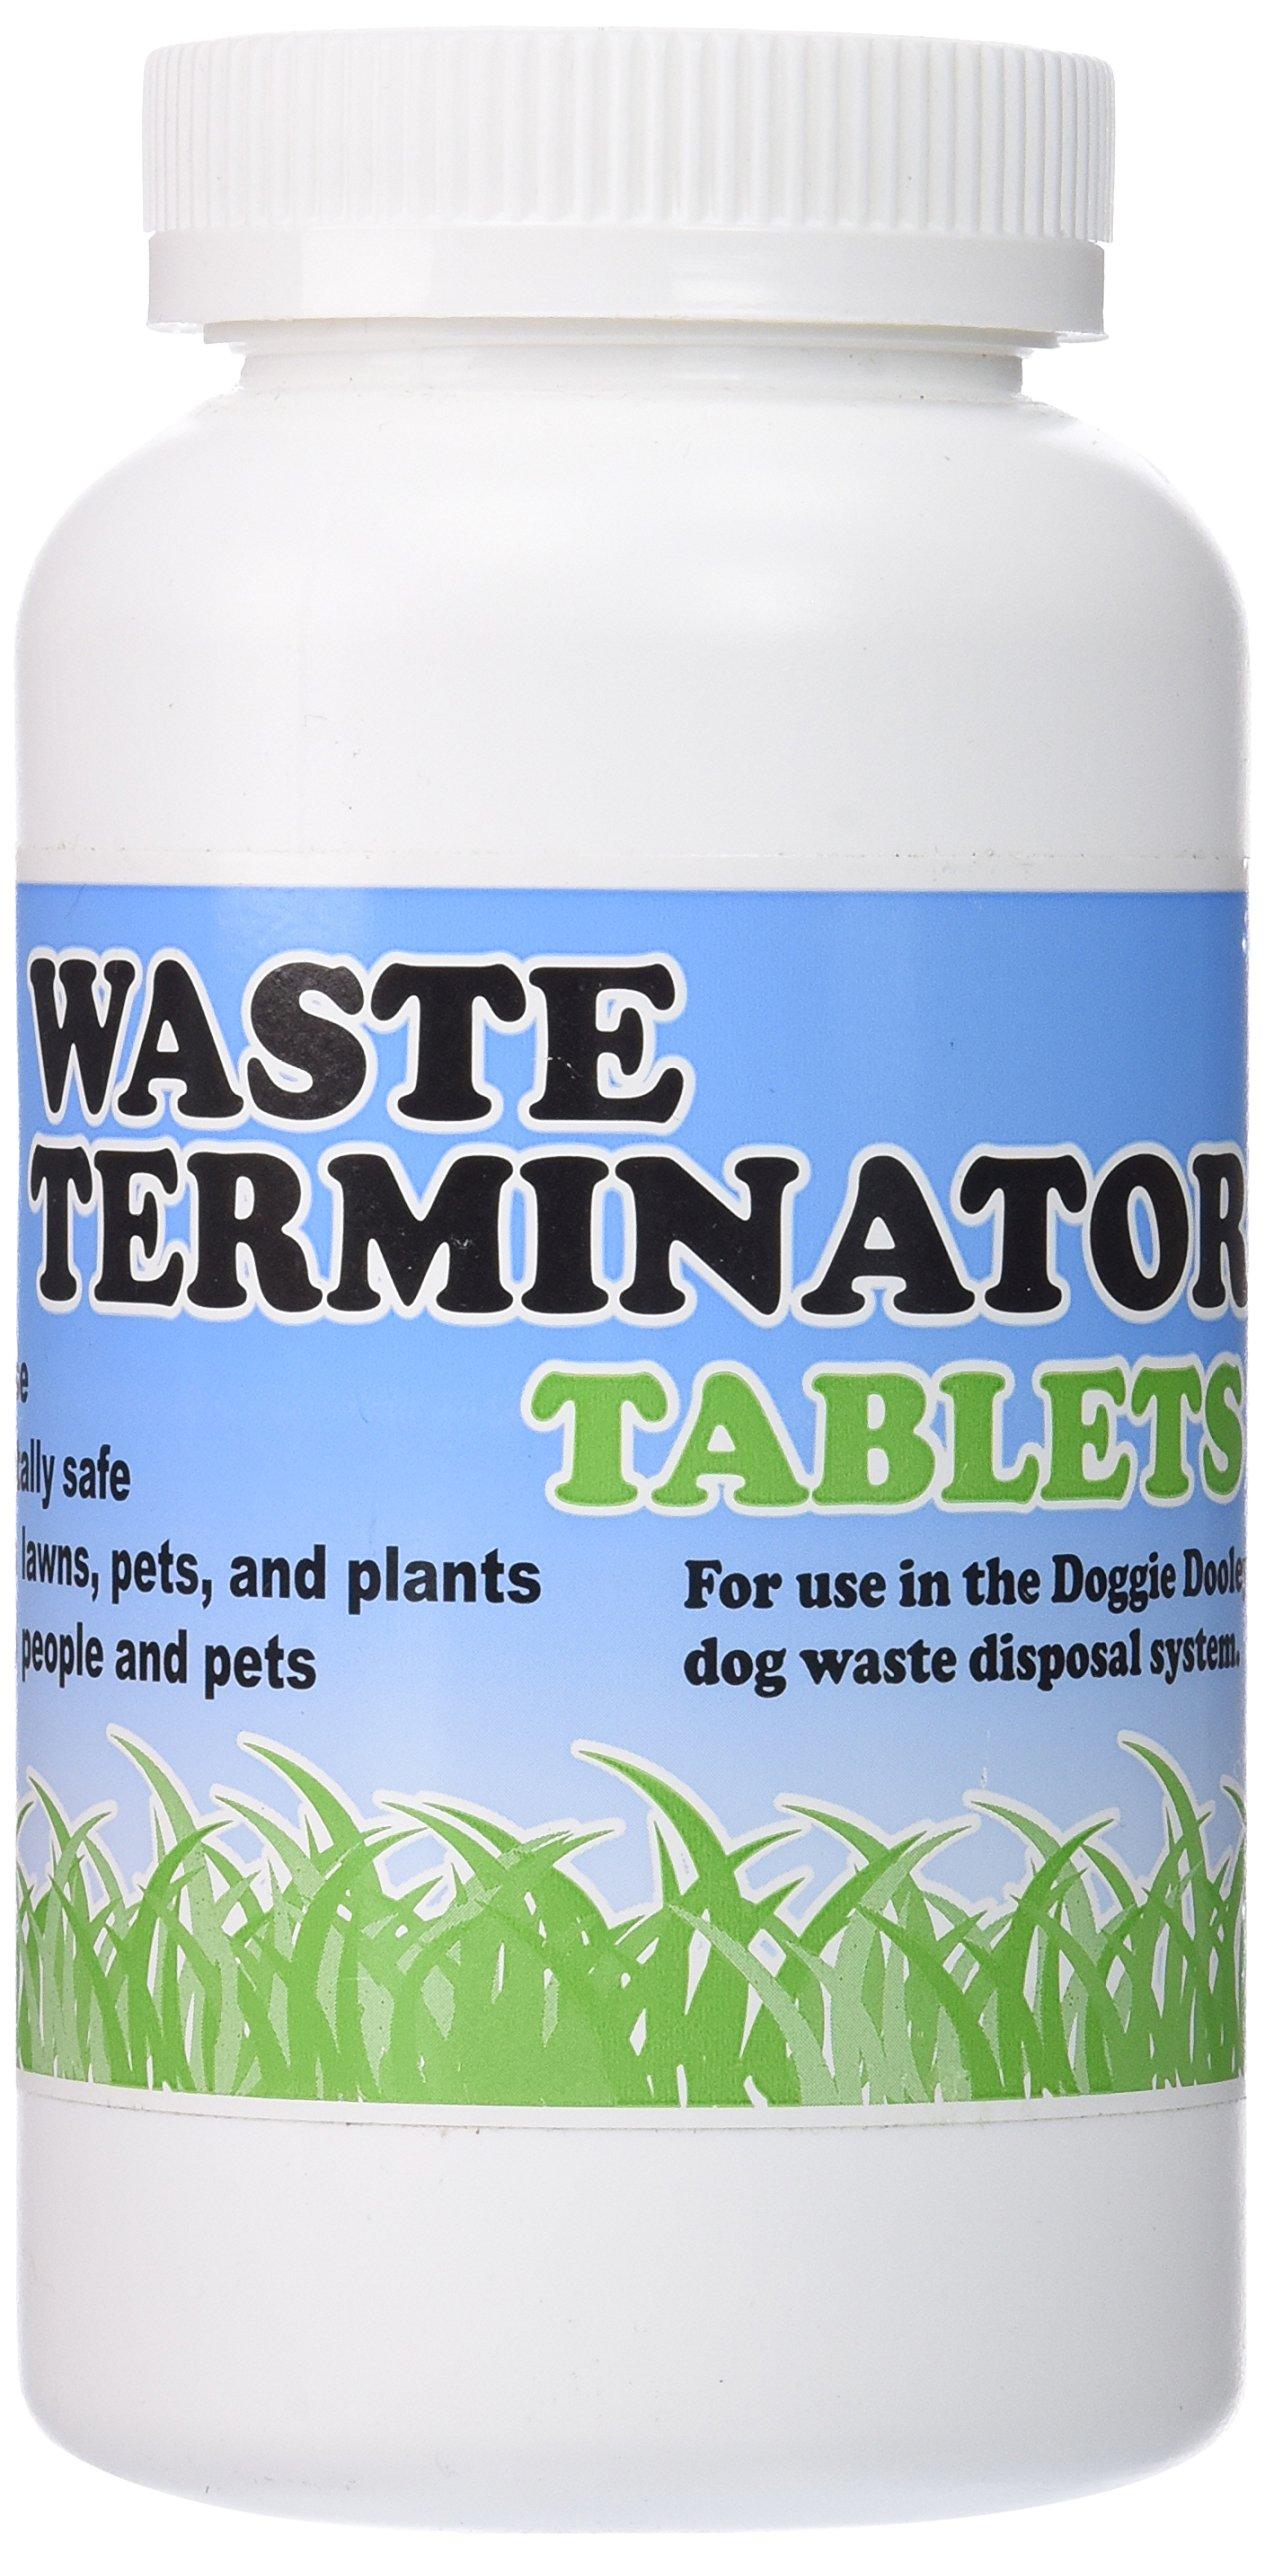 Hueter Toledo Doggie Dooley 100 Bottle Waste Terminator Tablets by Hueter Toledo